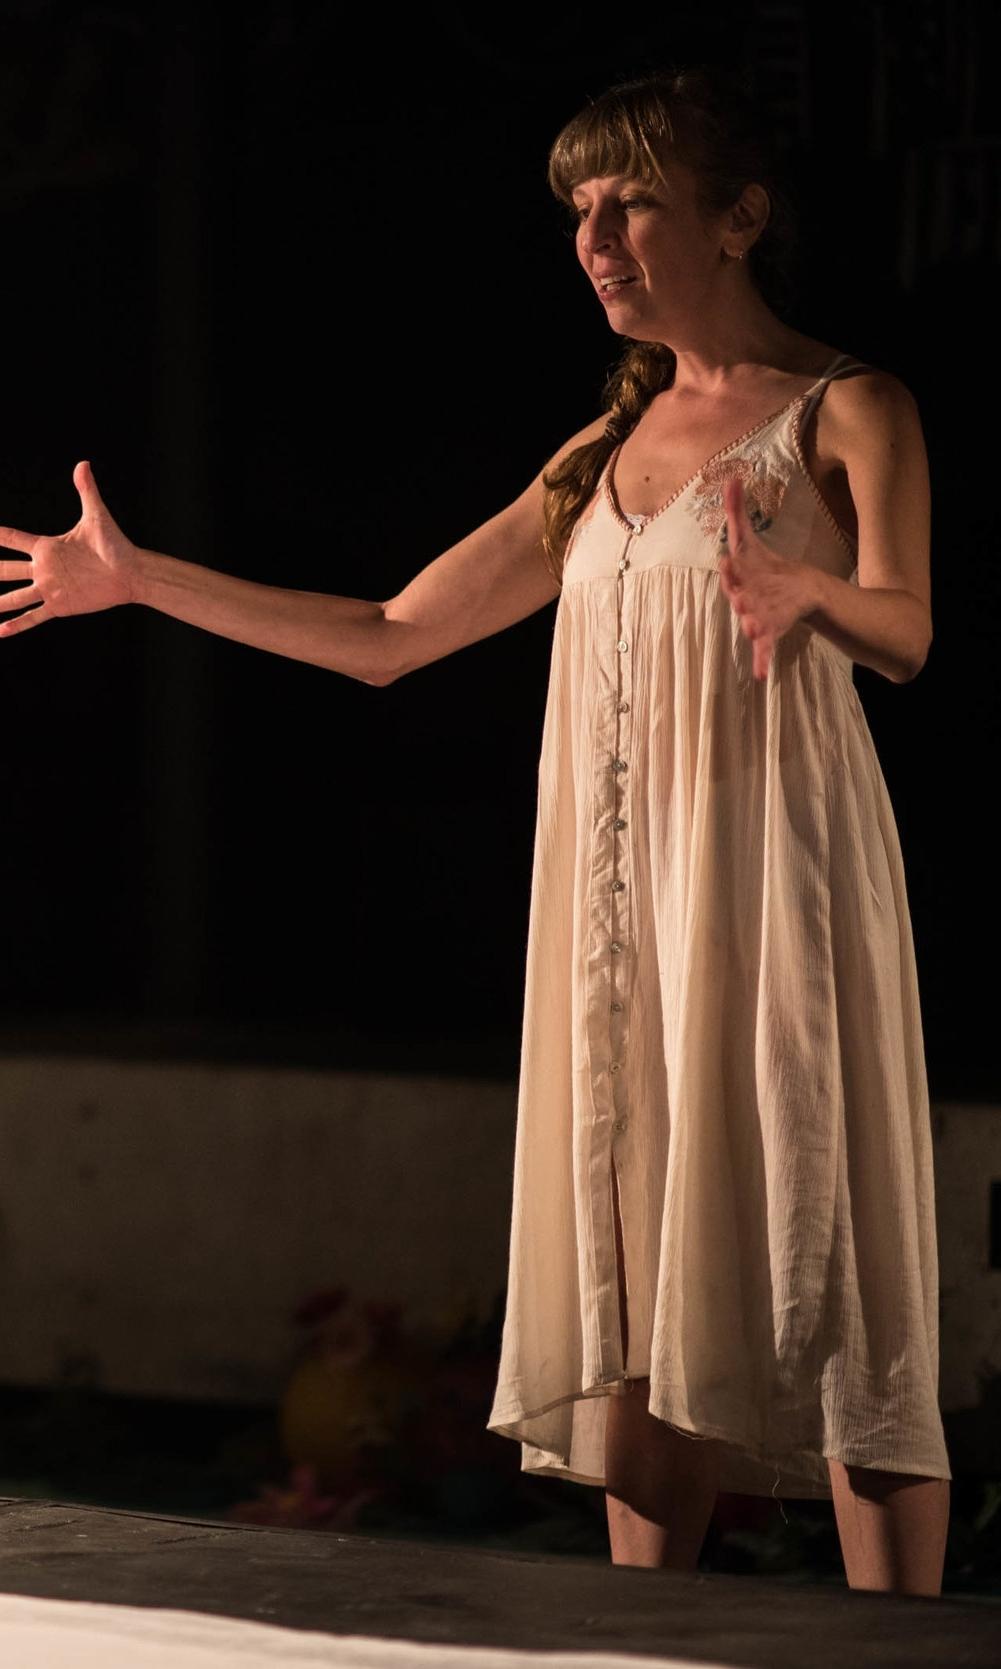 Jenna Harris as Lela. Photo by Dahlia Katz